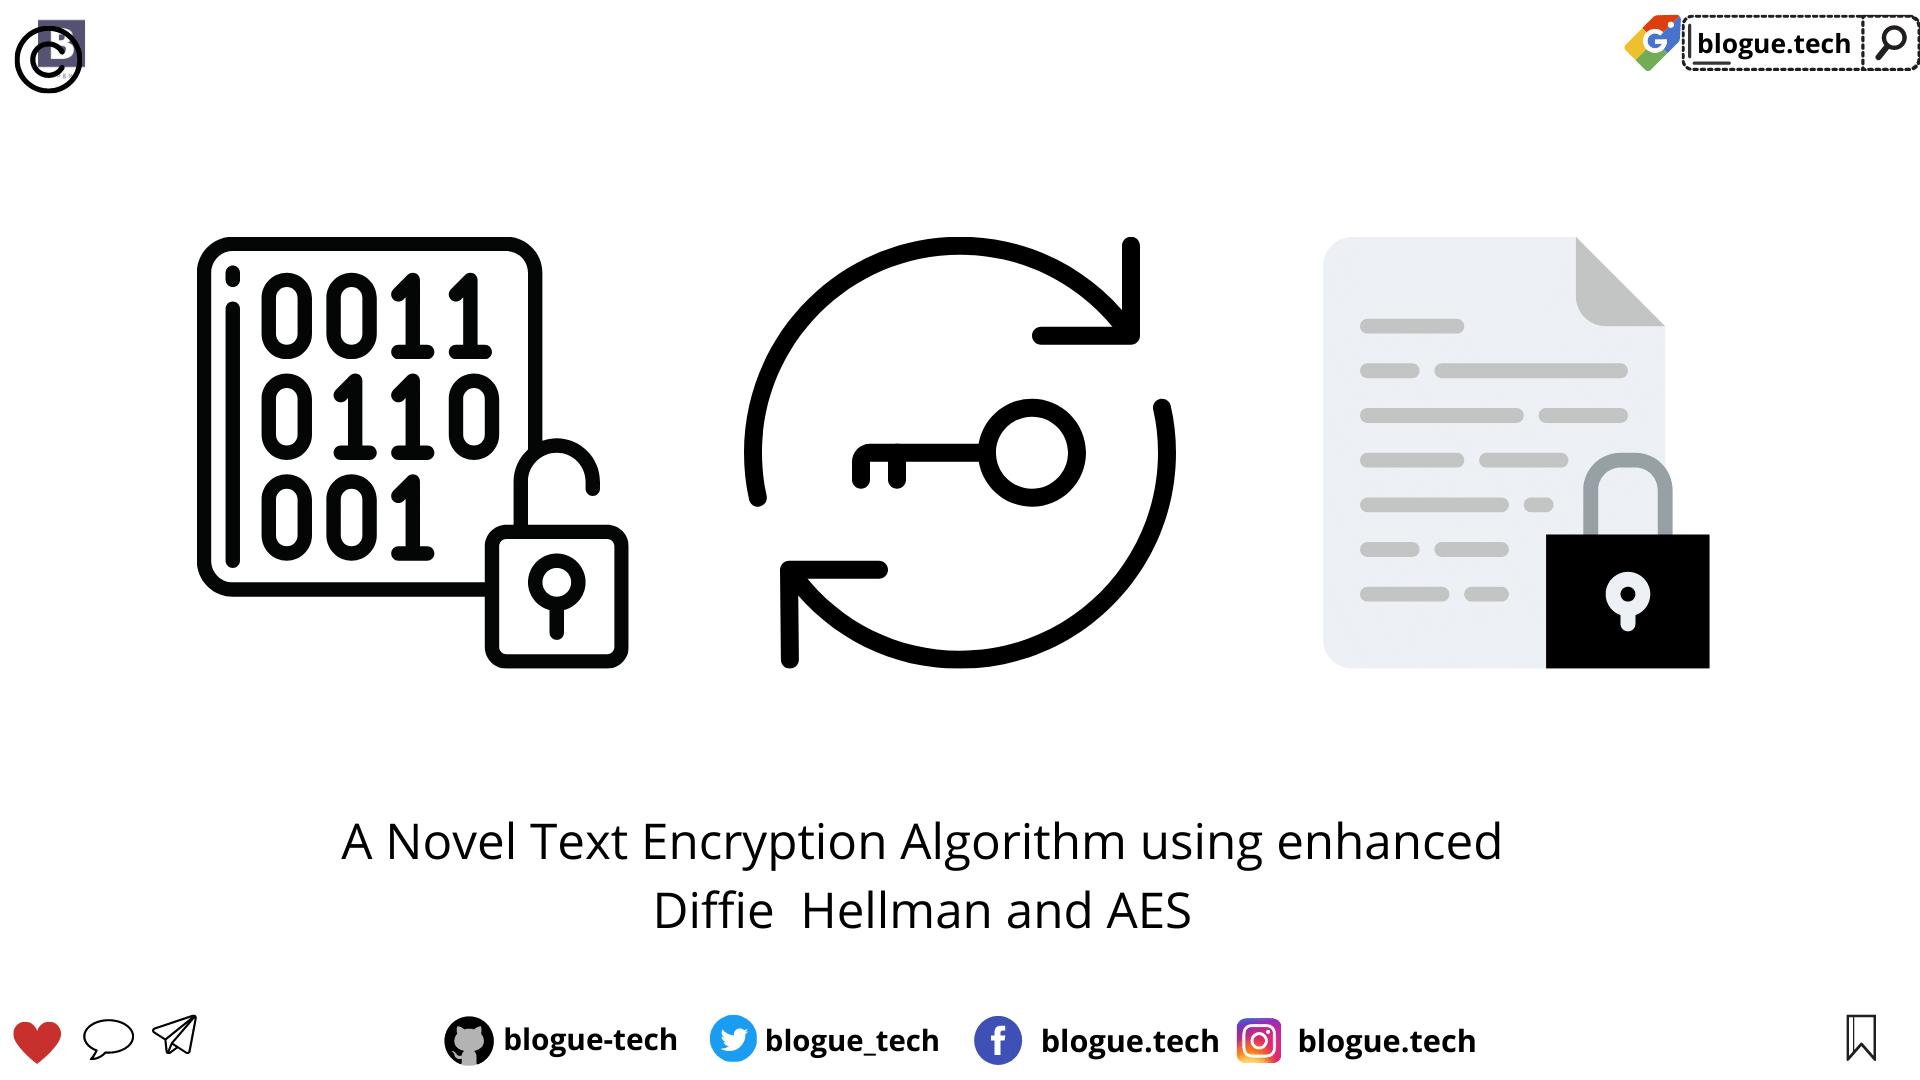 A Novel Text Encryption Algorithm using enhanced Diffie  Hellman and AES